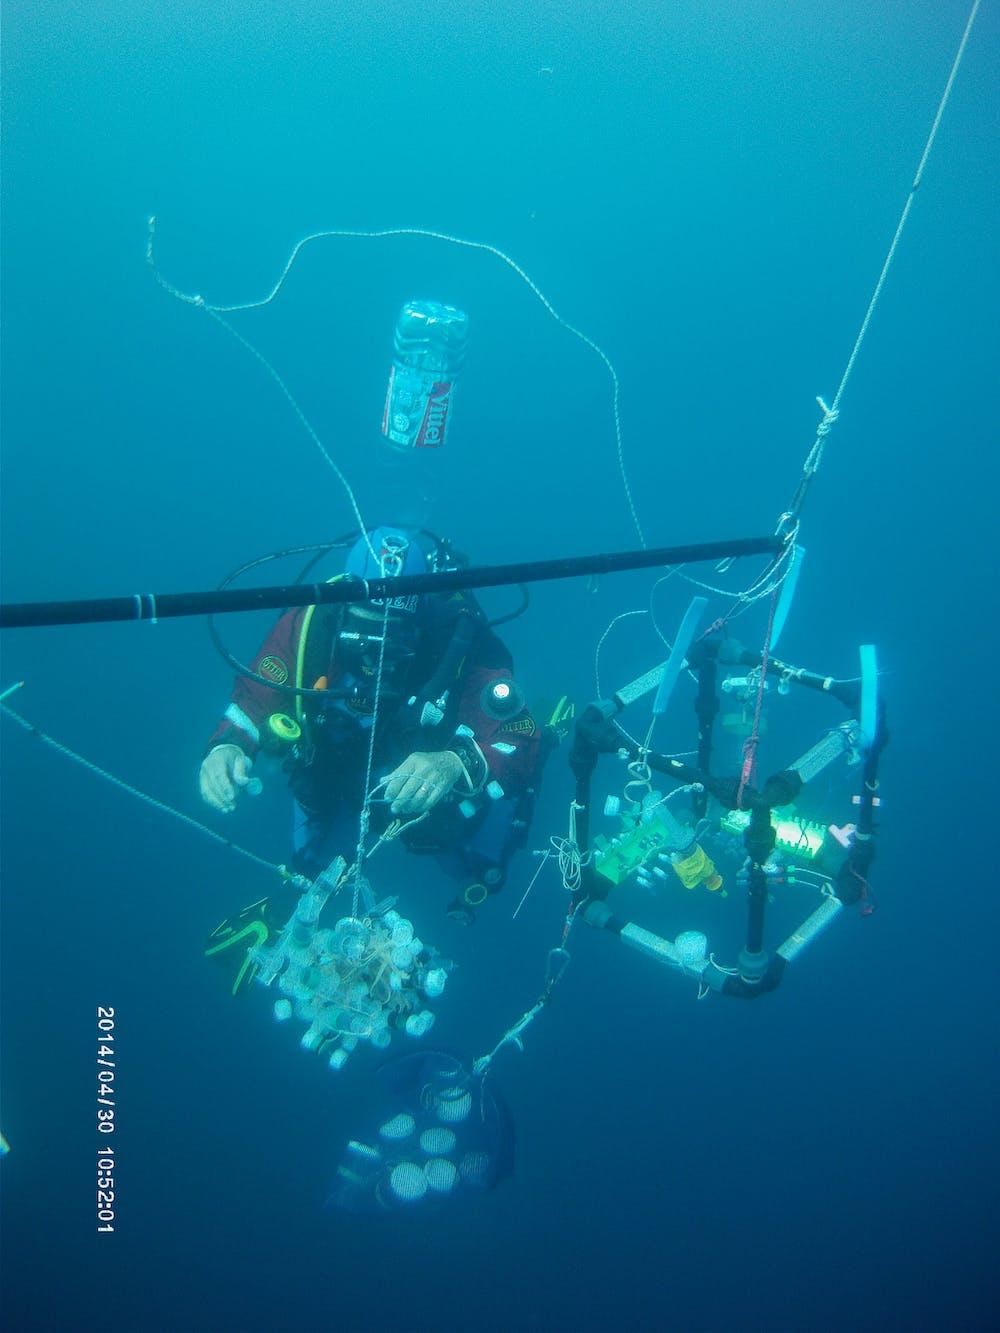 The 'salpatron' allows researchers to conduct feeding studies underwater.  Gitai Yahel/Ayelet Dadon-Pilosof (www.gitaiyahel.com), CC BY-ND